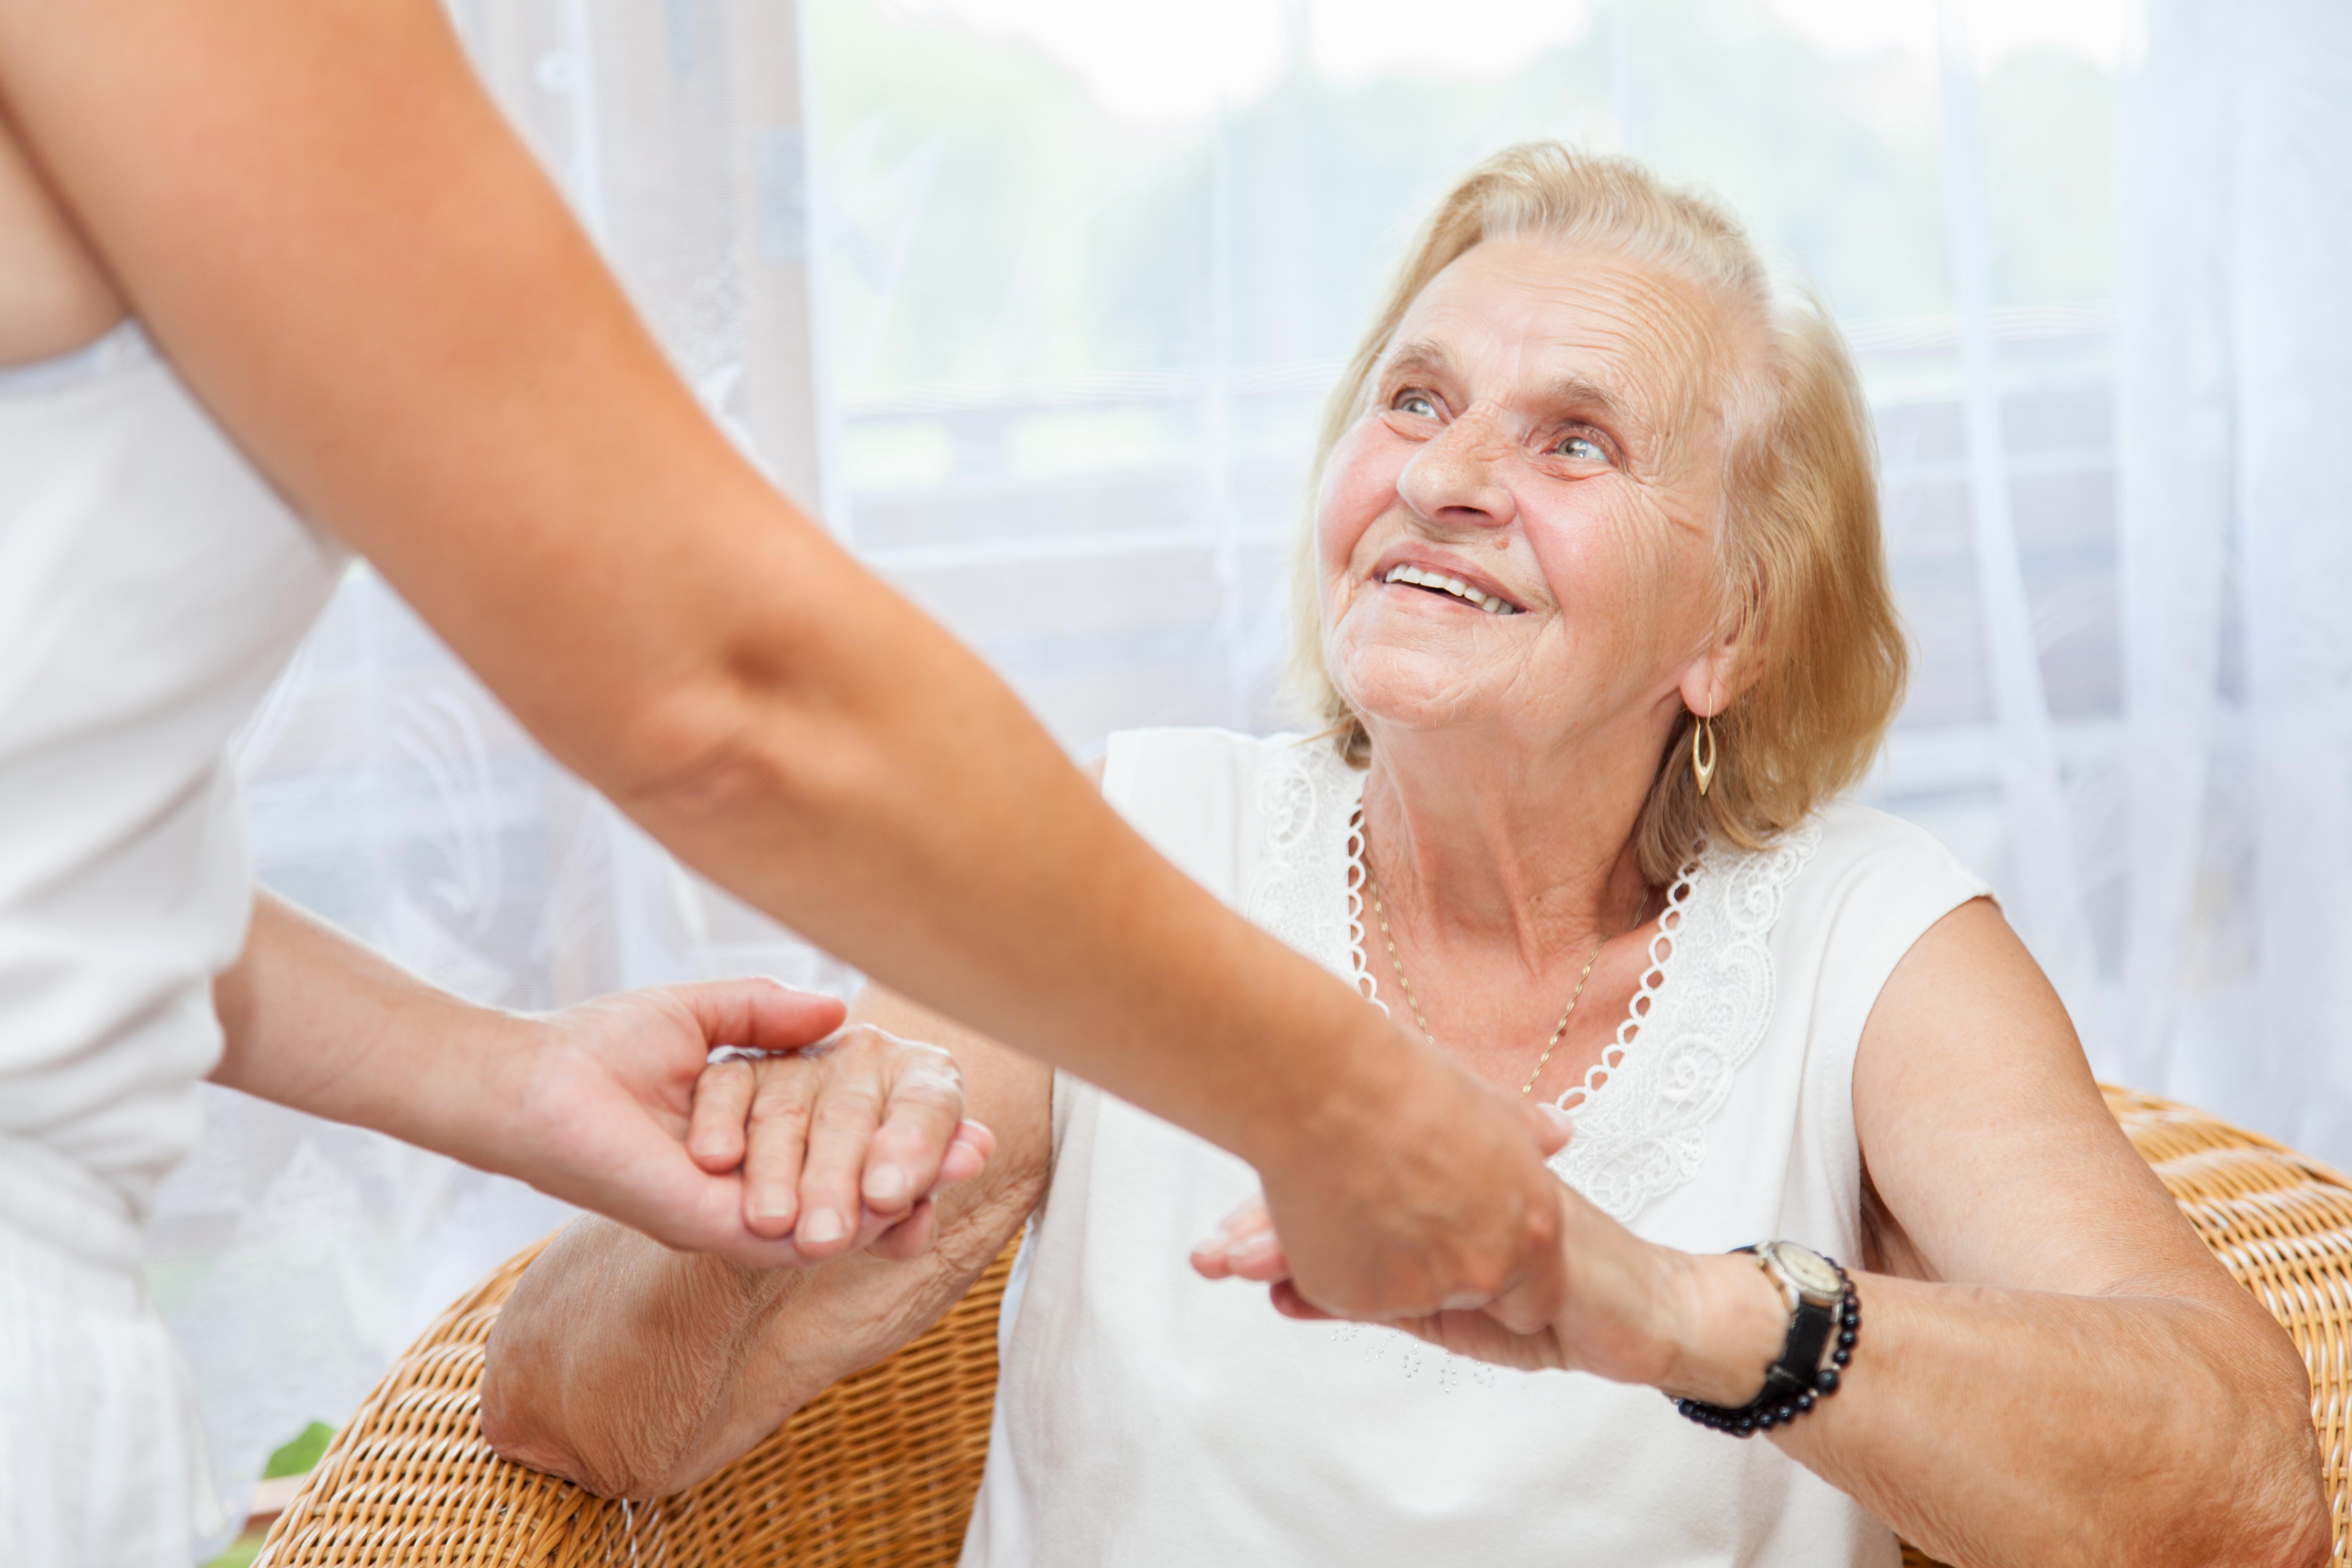 Providing care and support for elderly in coronavirus